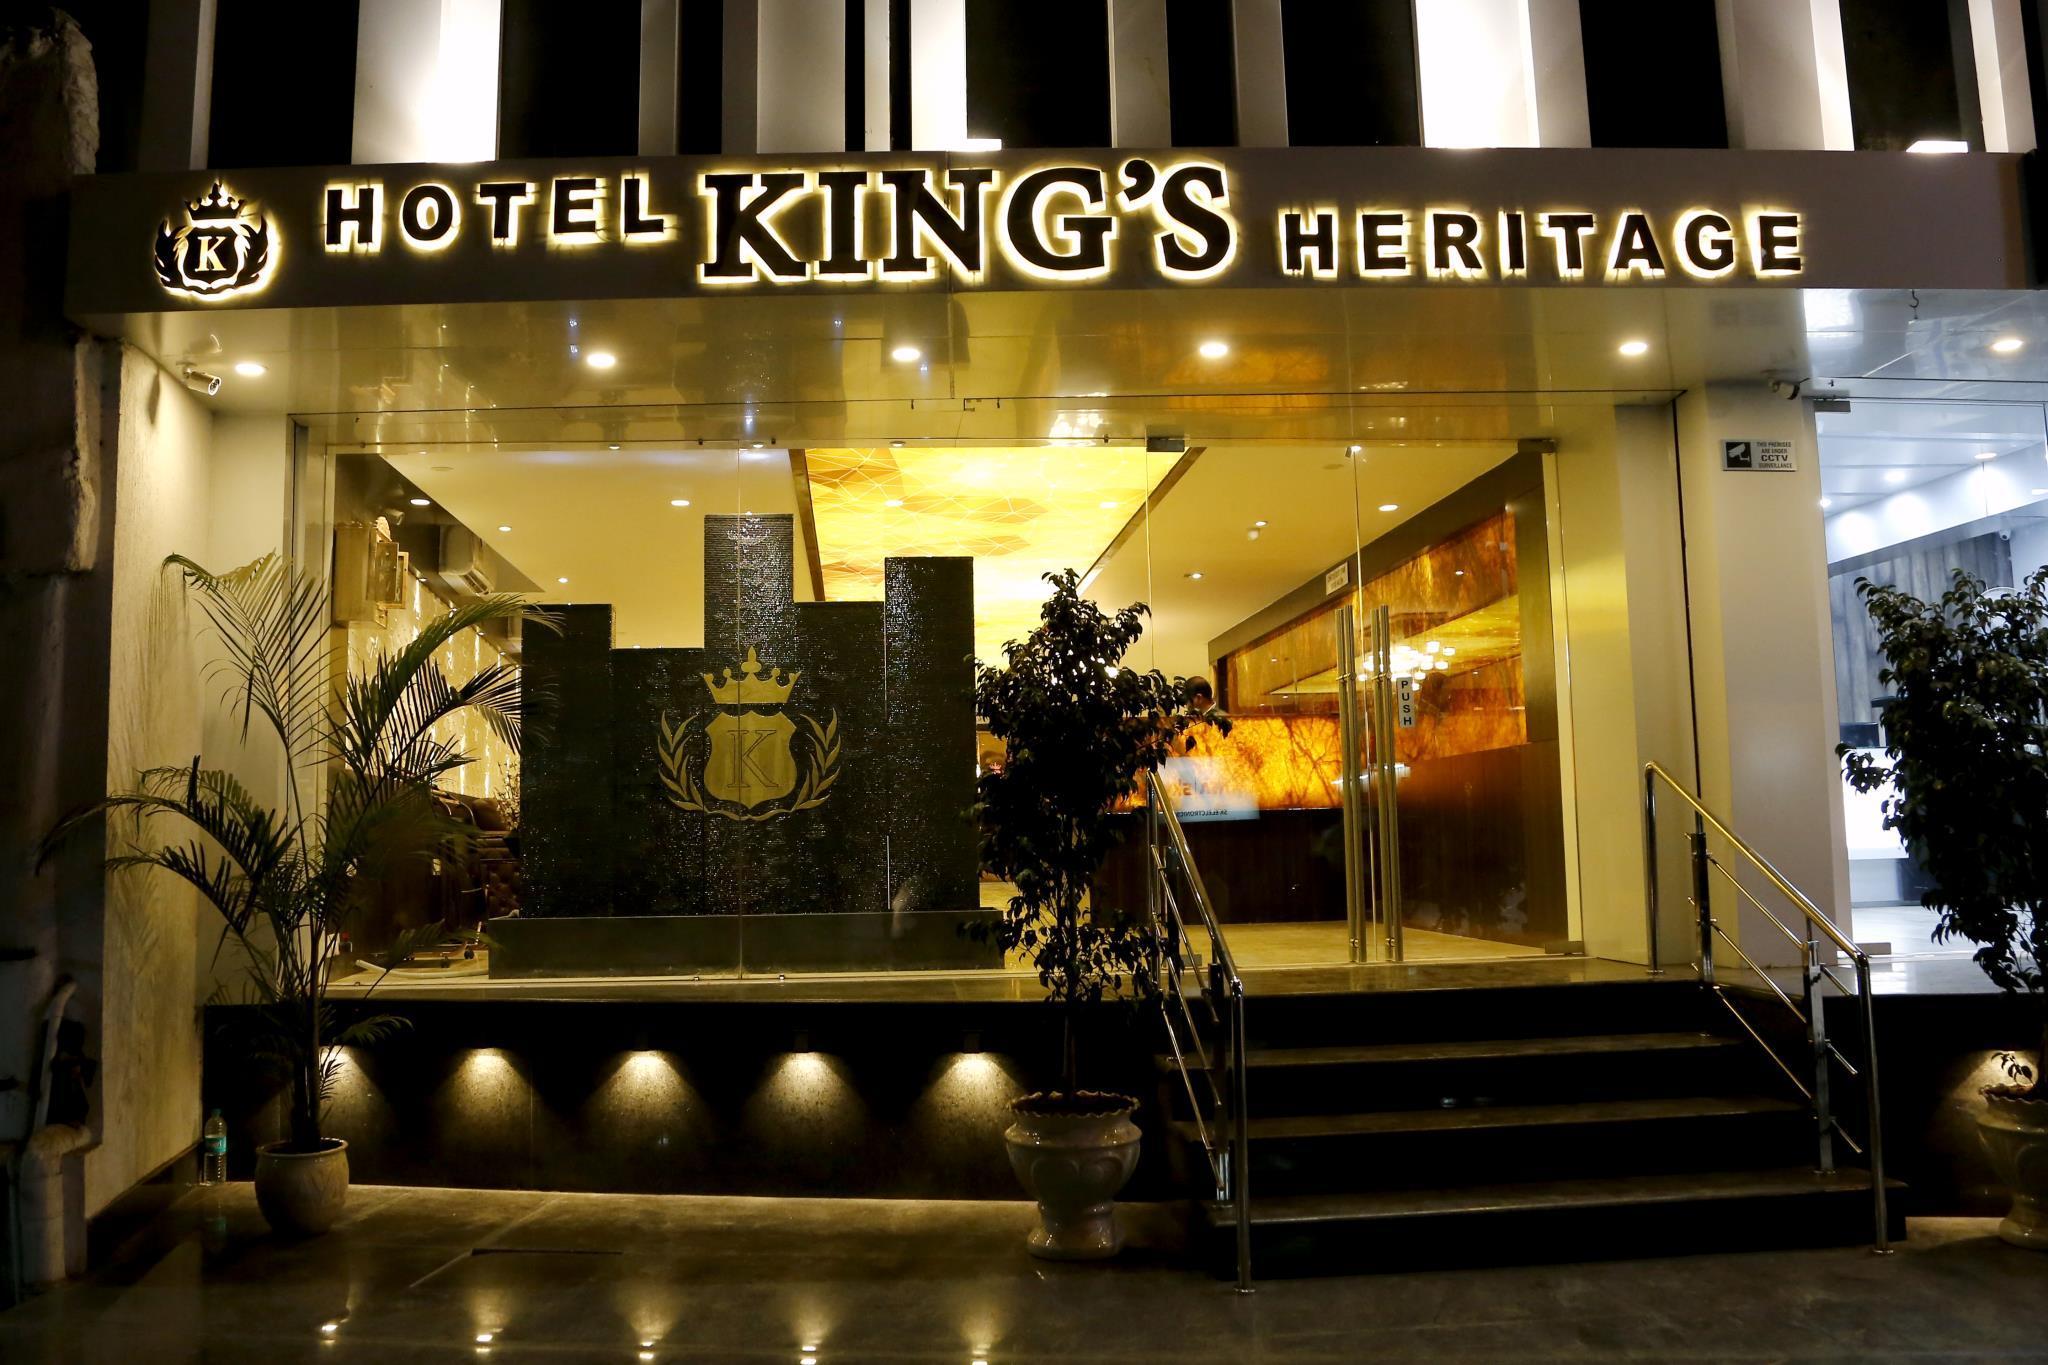 Hotel King's Heritage